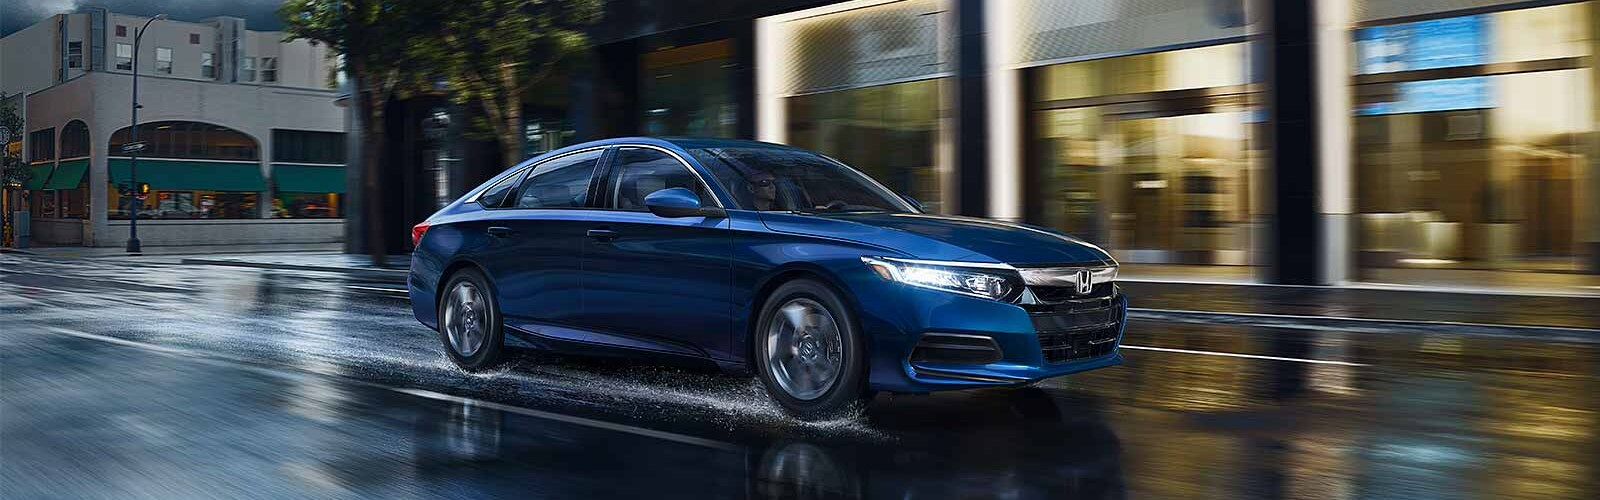 New and Used Honda dealership in Southgate | Genthe Honda